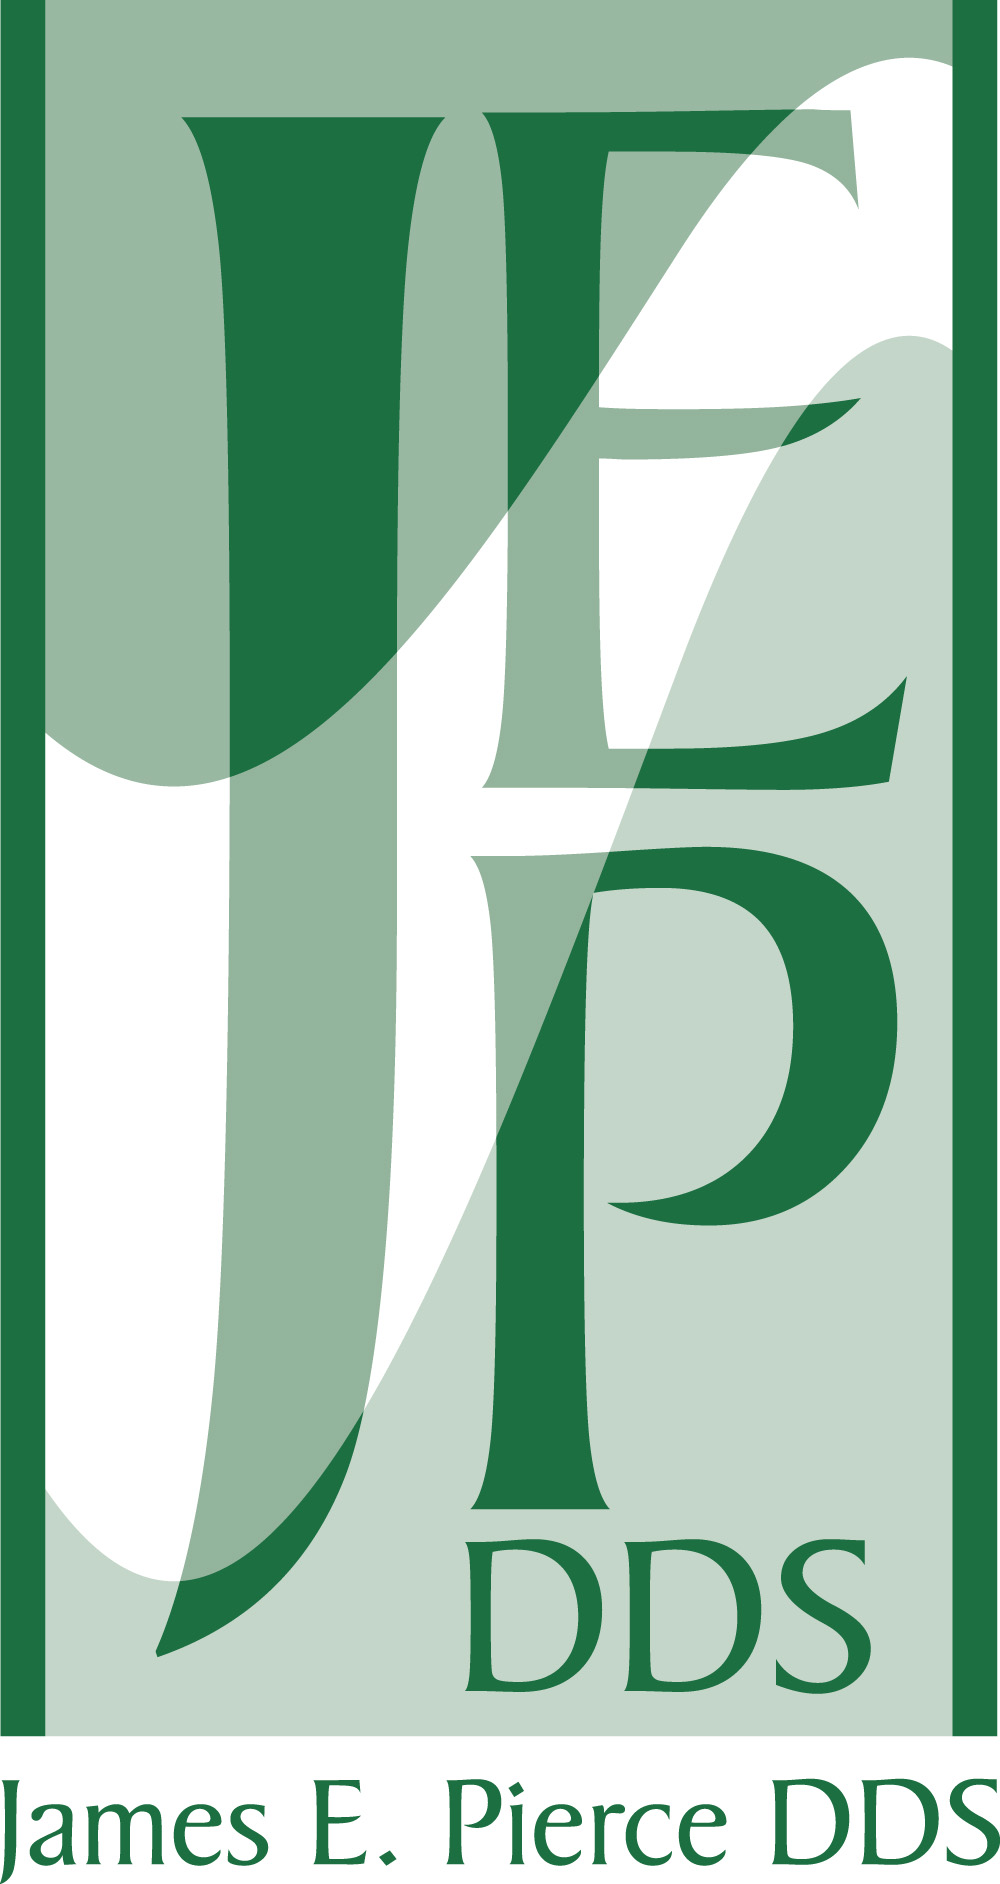 JamesEPierceDDS_logo_CMYK.jpg